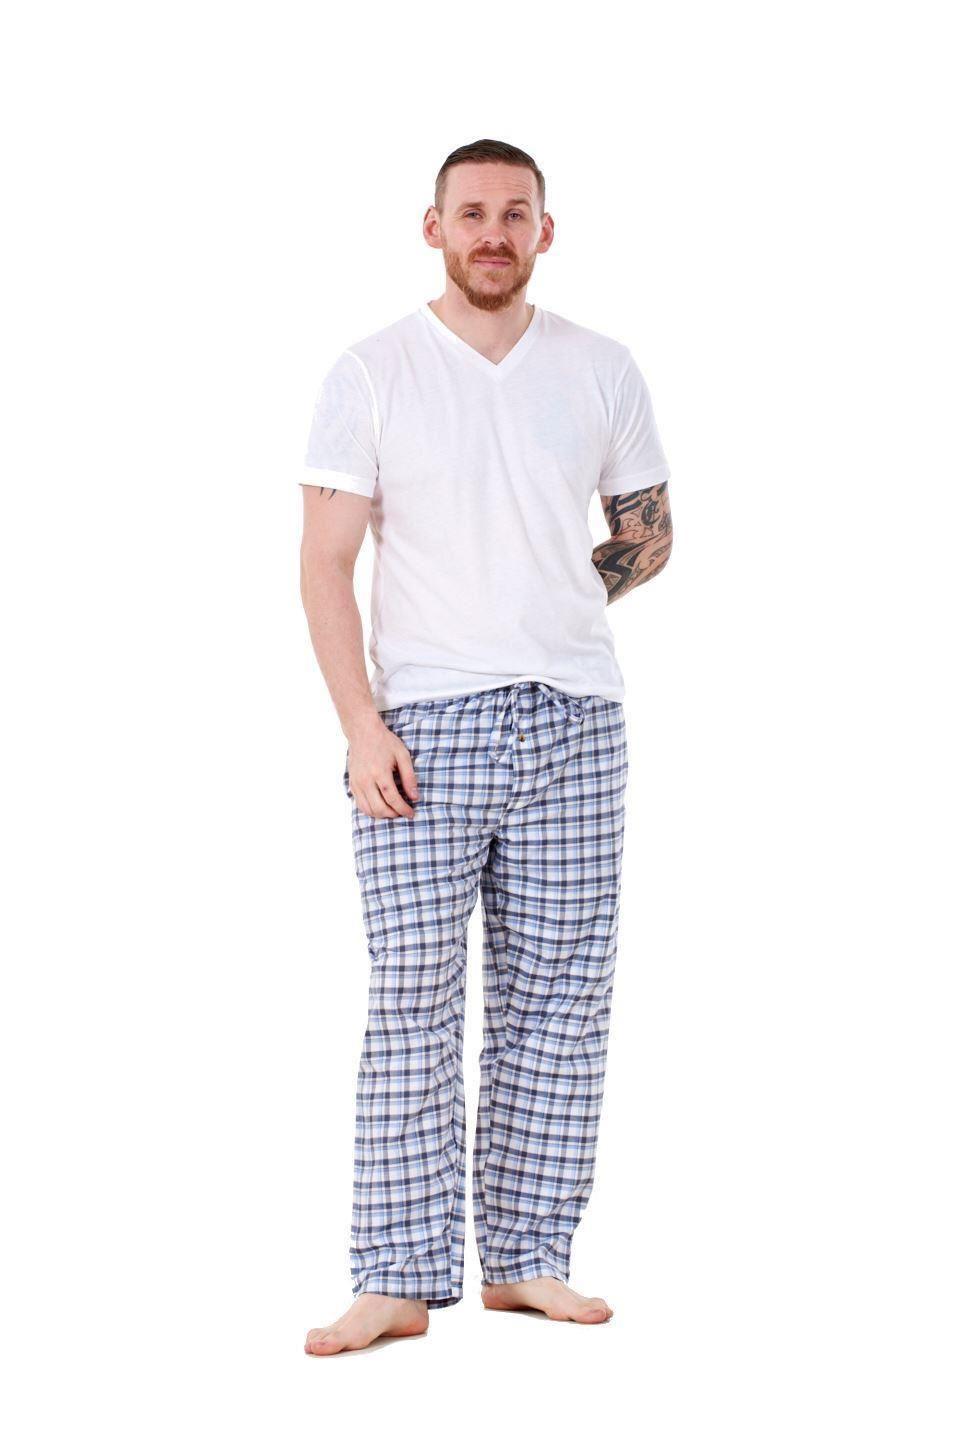 Mens-Pyjama-Bottoms-Rich-Cotton-Woven-Check-Lounge-Pant-Nightwear-Big-3XL-to-5XL Indexbild 64